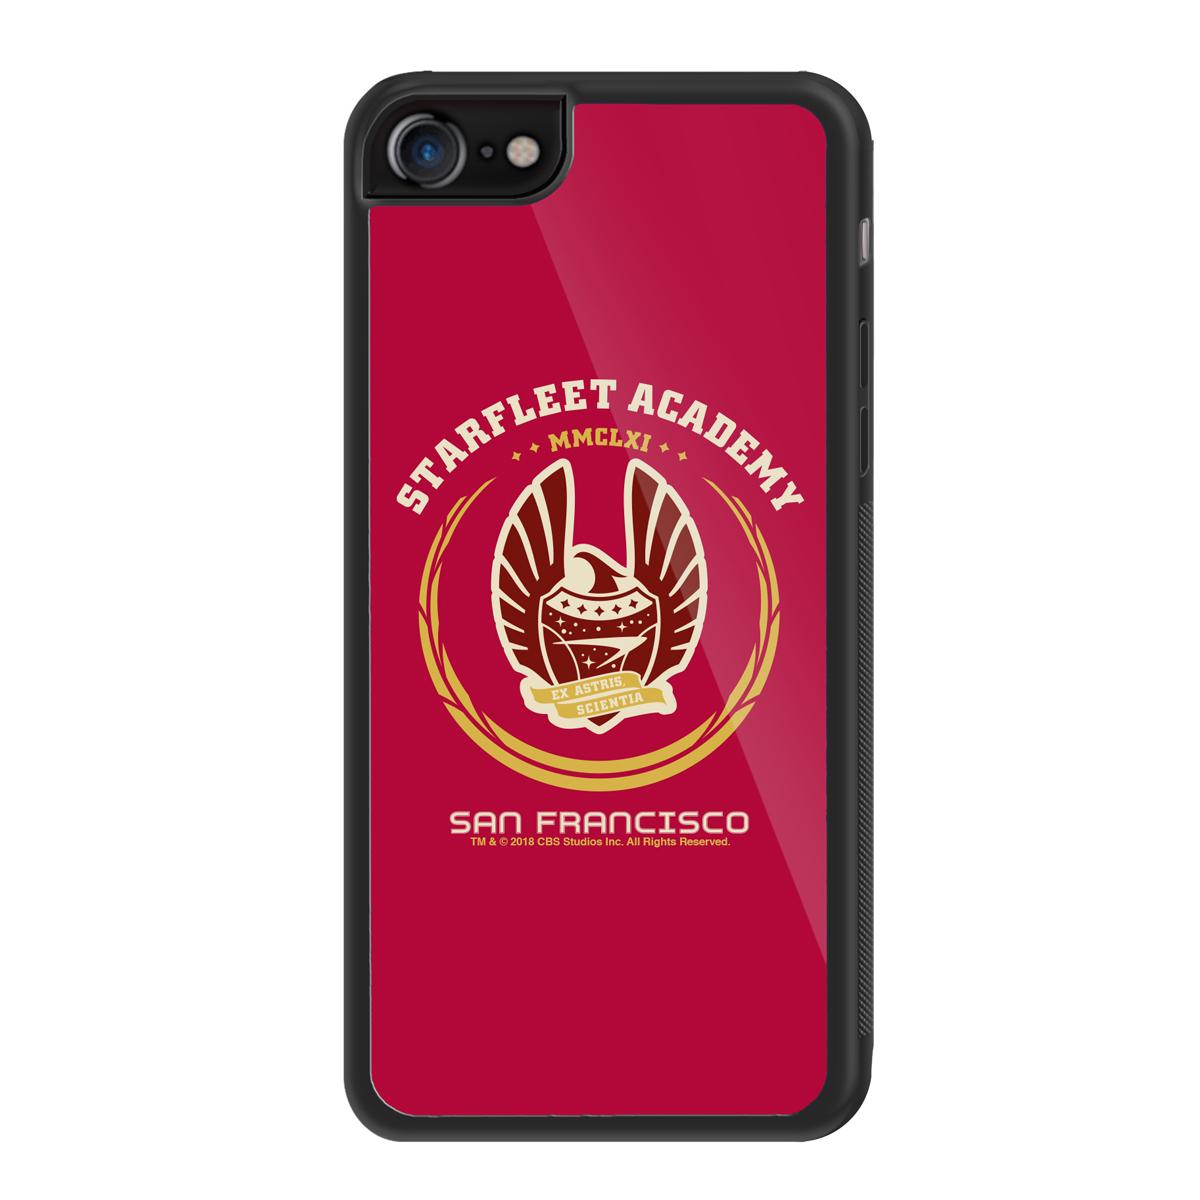 Star Trek Starfleet Academy San Francisco iPhone Case